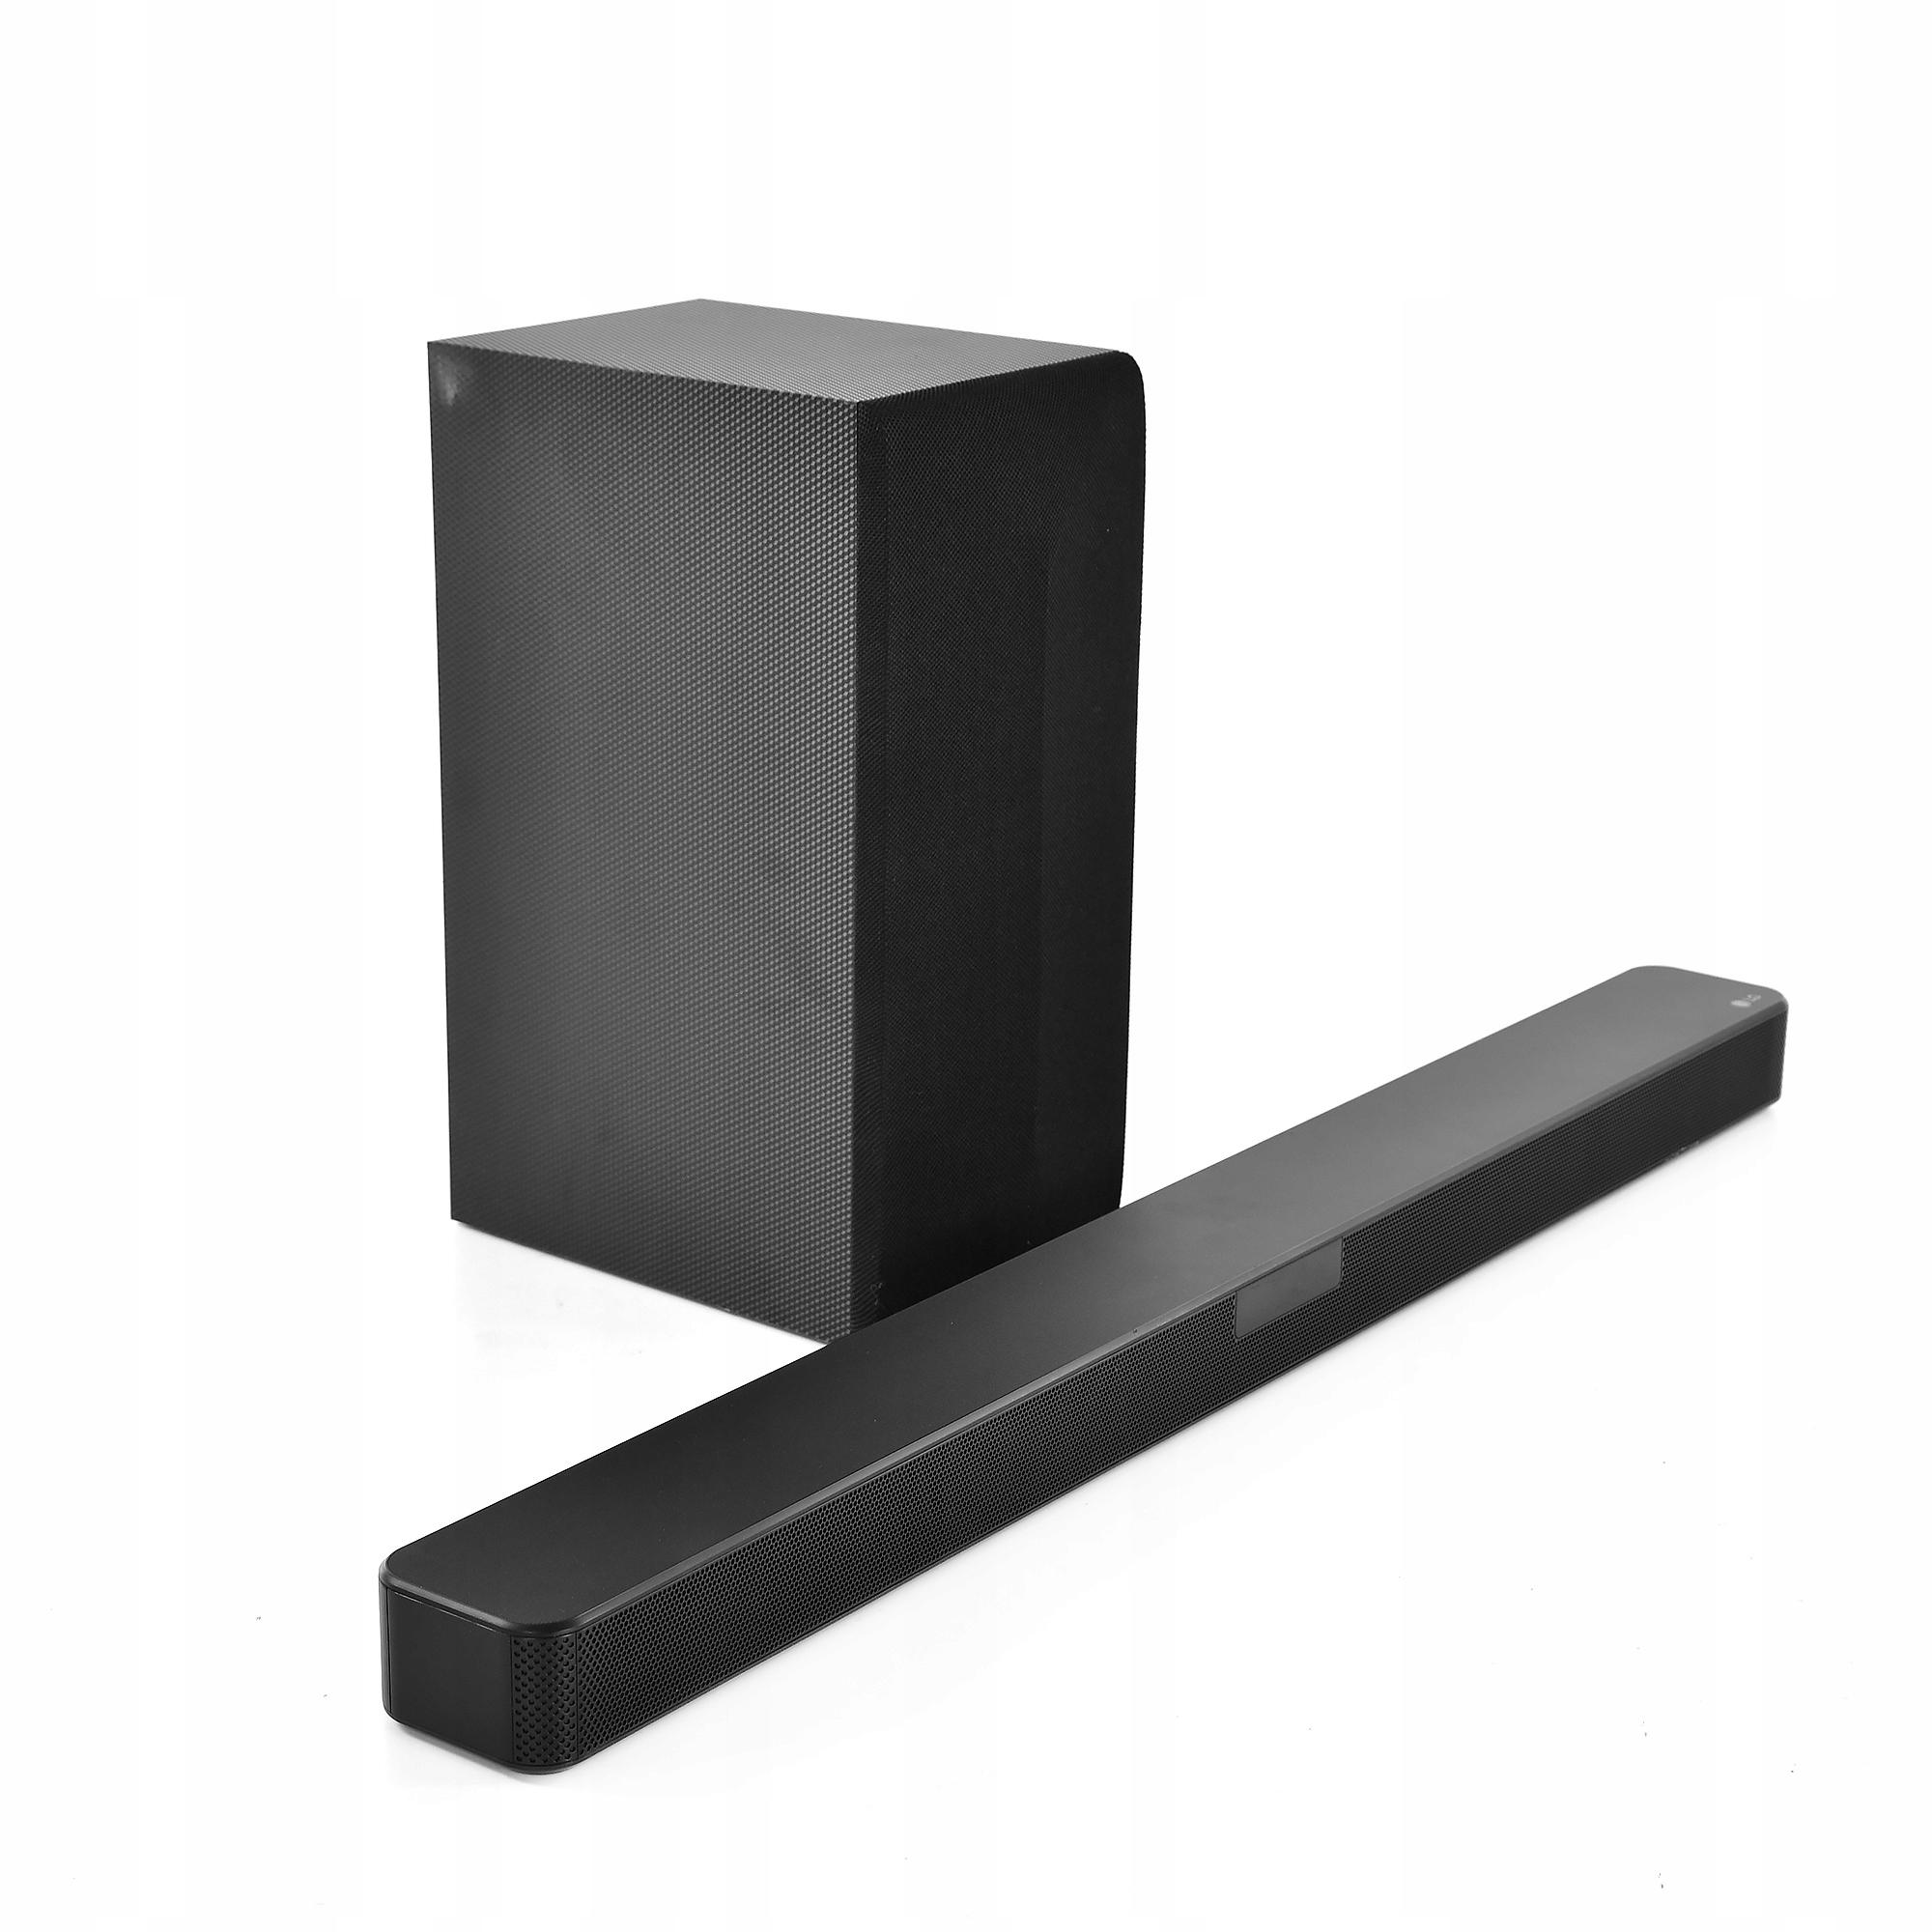 Stereo soundbar LG SN4